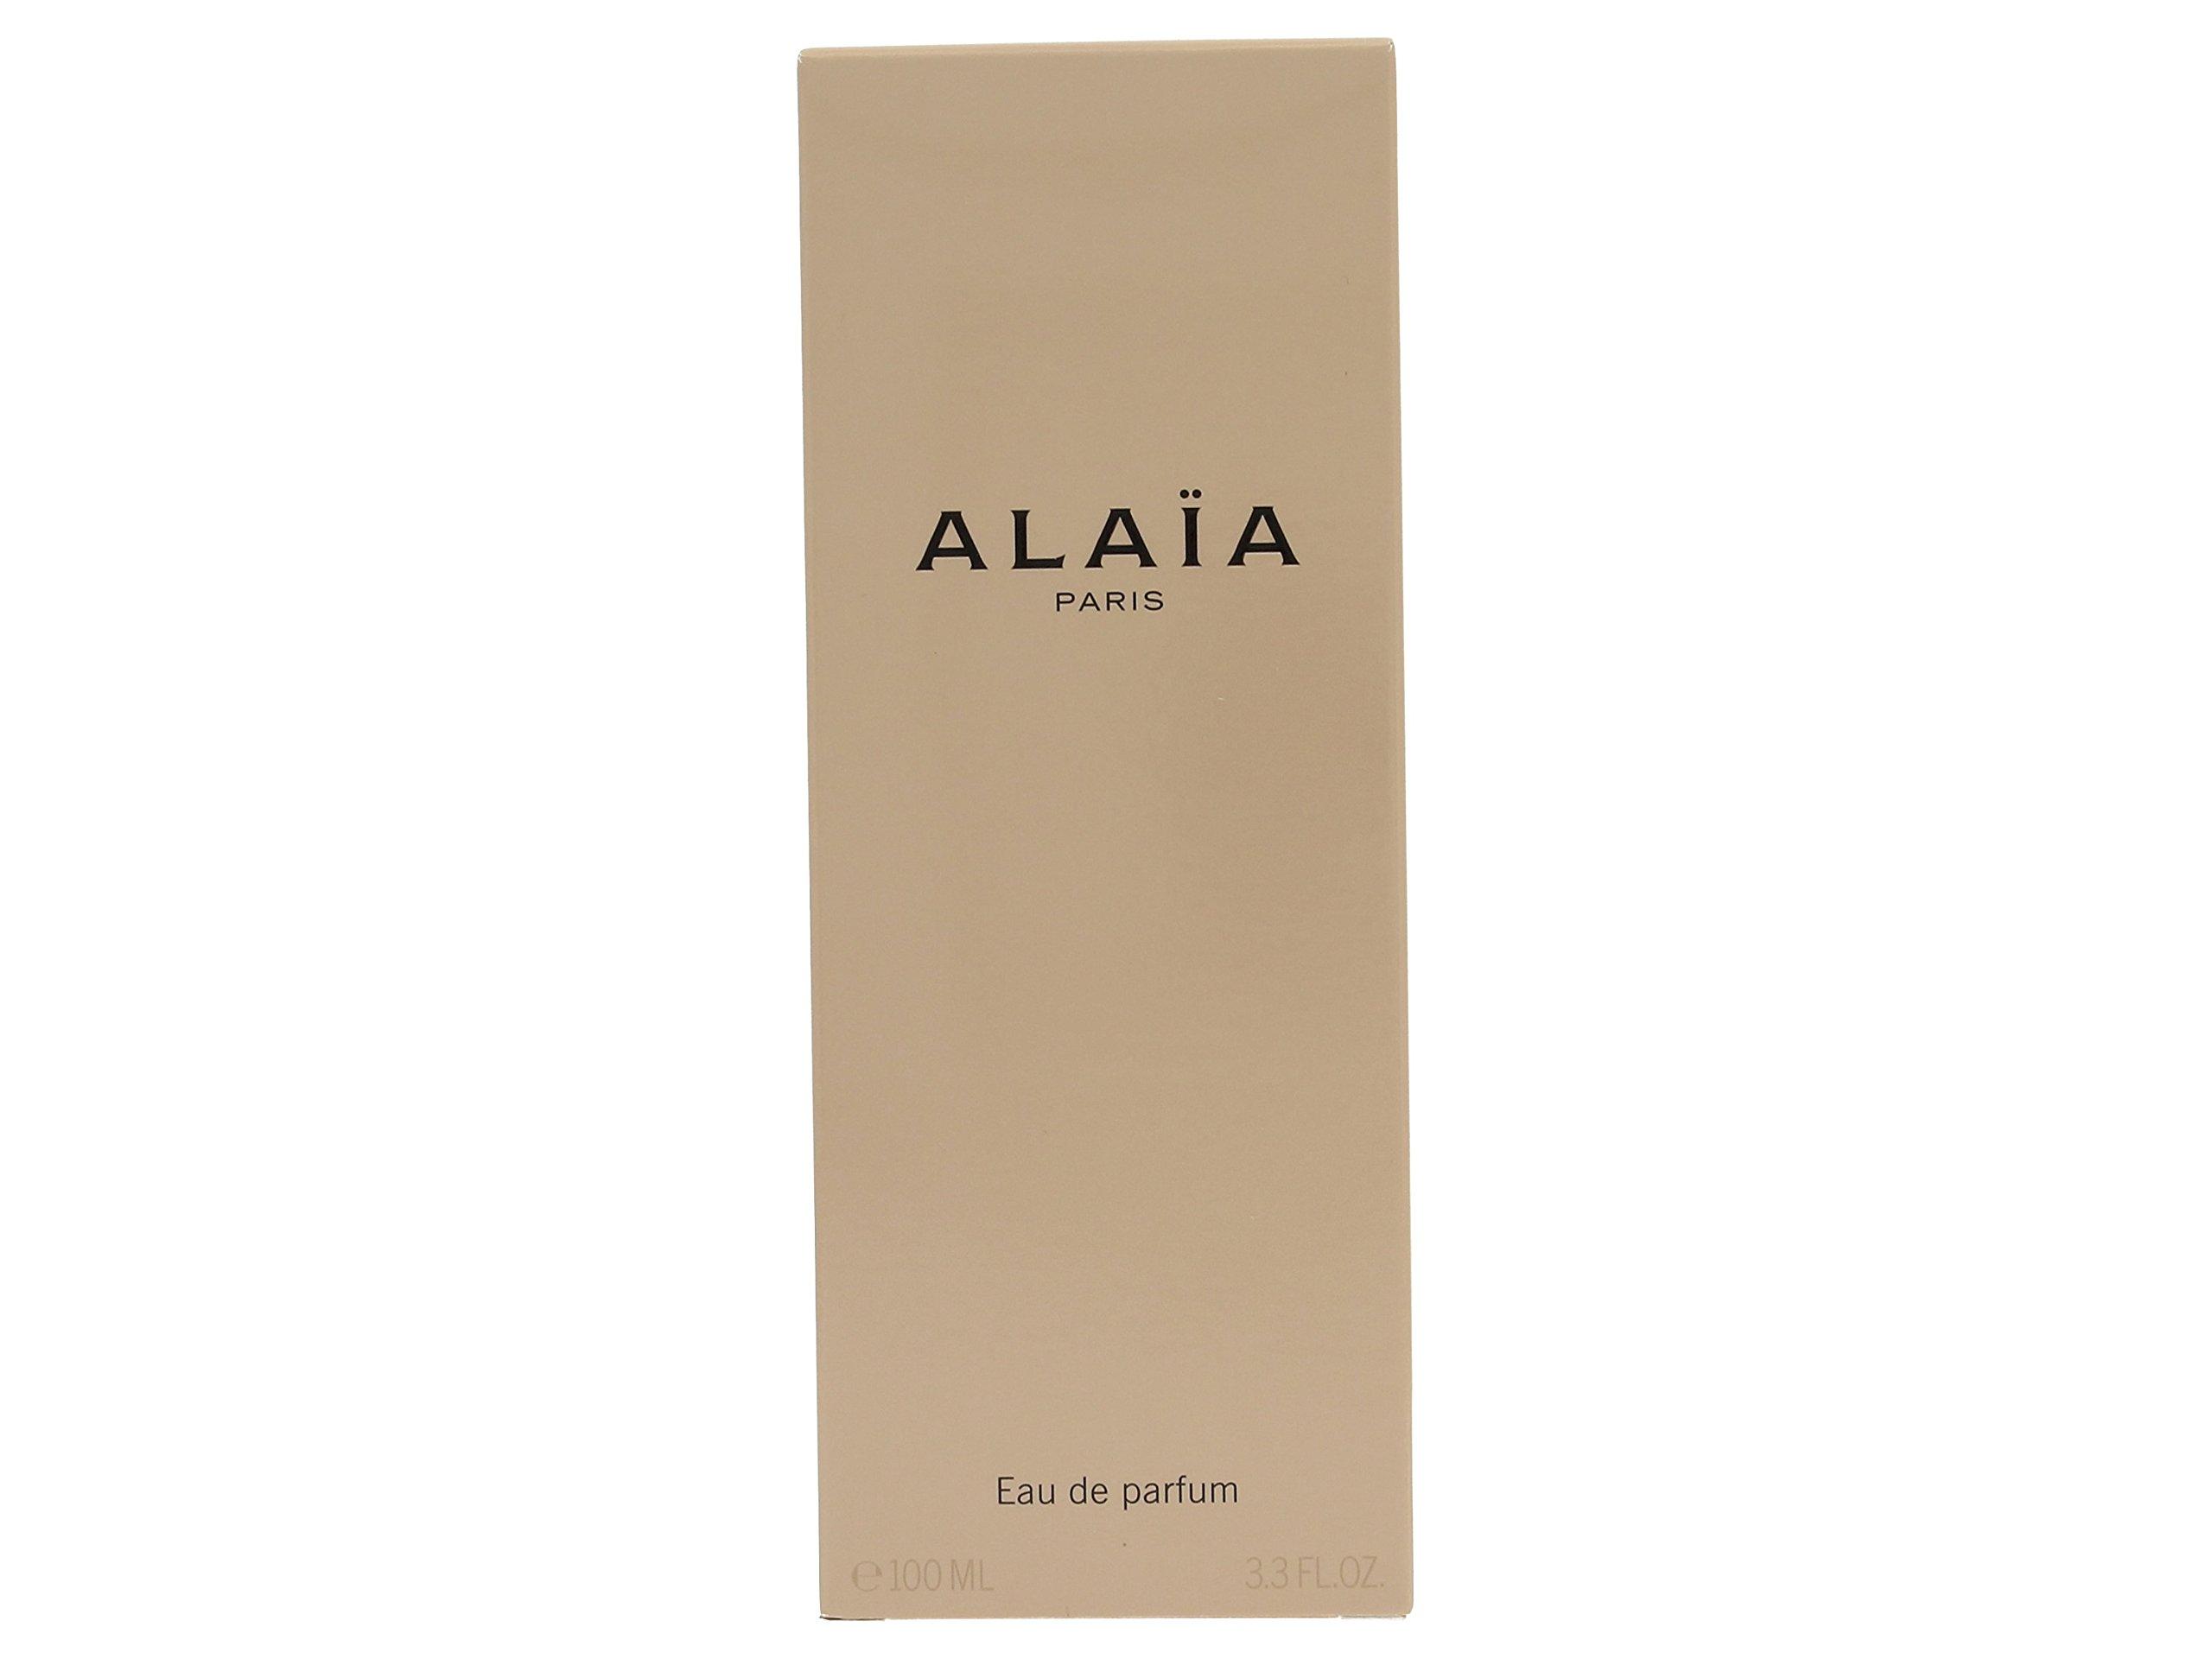 Buy Alaia Now!